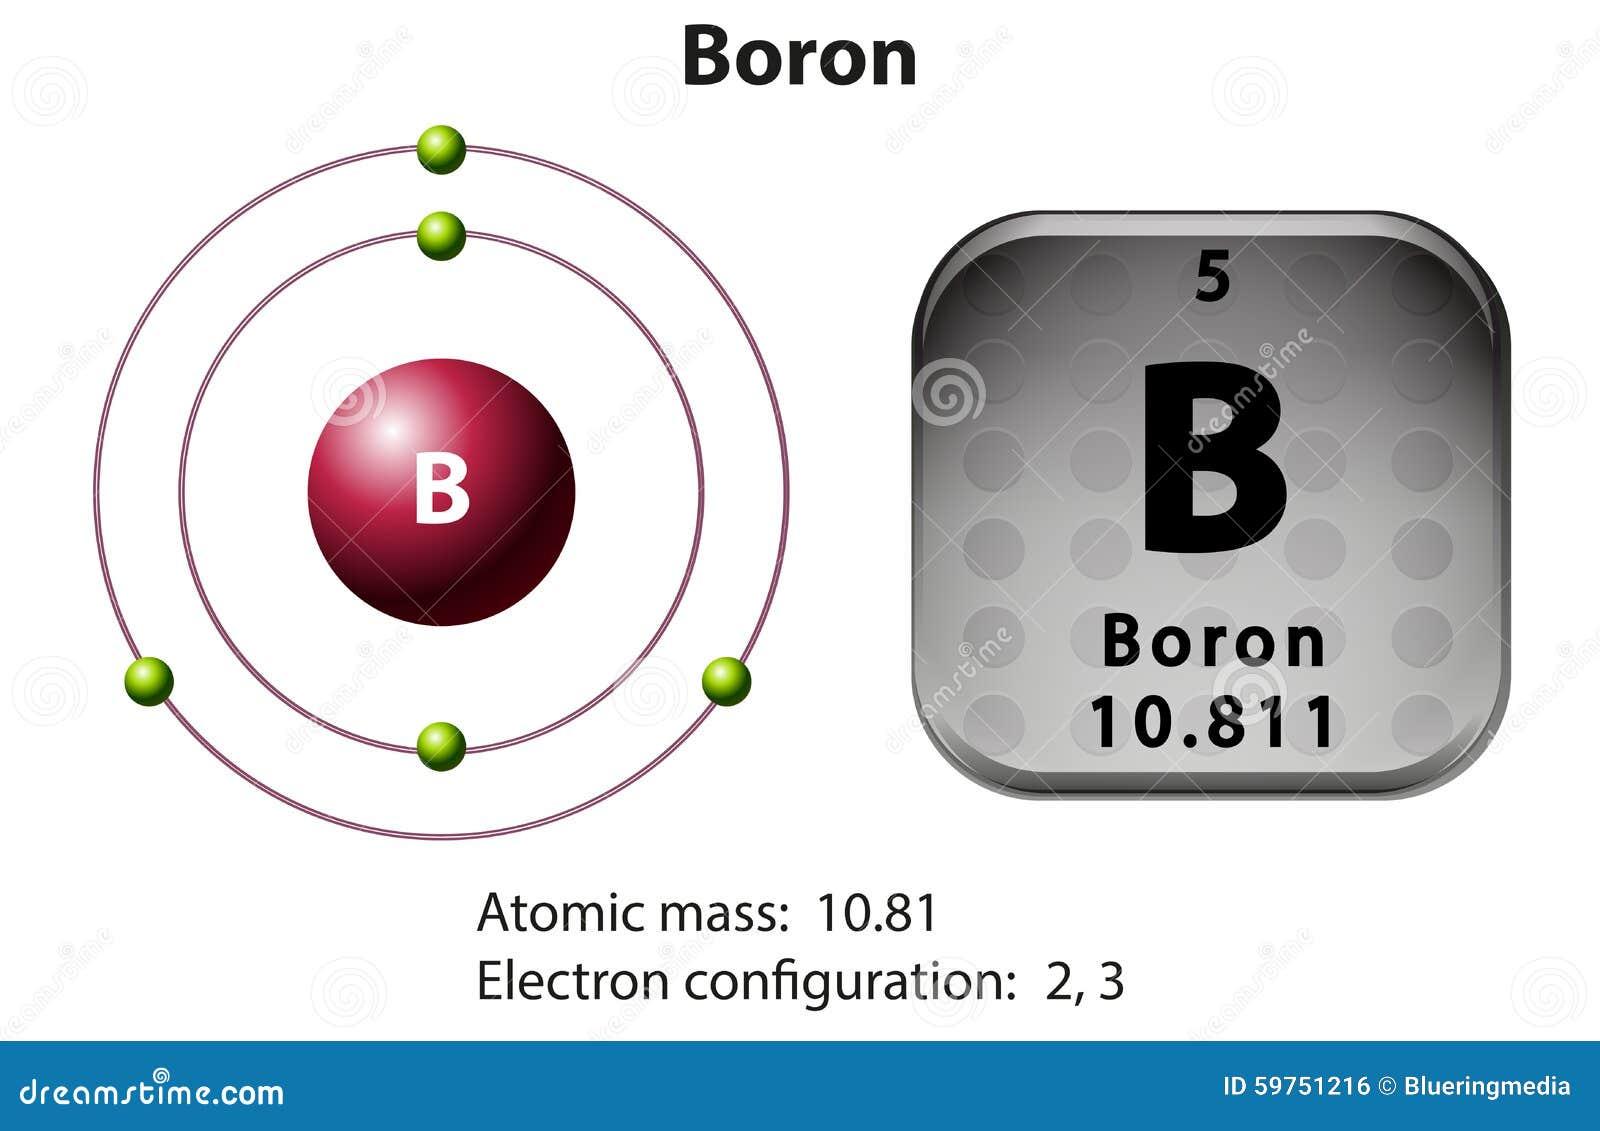 symbol and electron diagram boron stock vector illustration of rh dreamstime com boron ellingham diagram boron orbital diagram